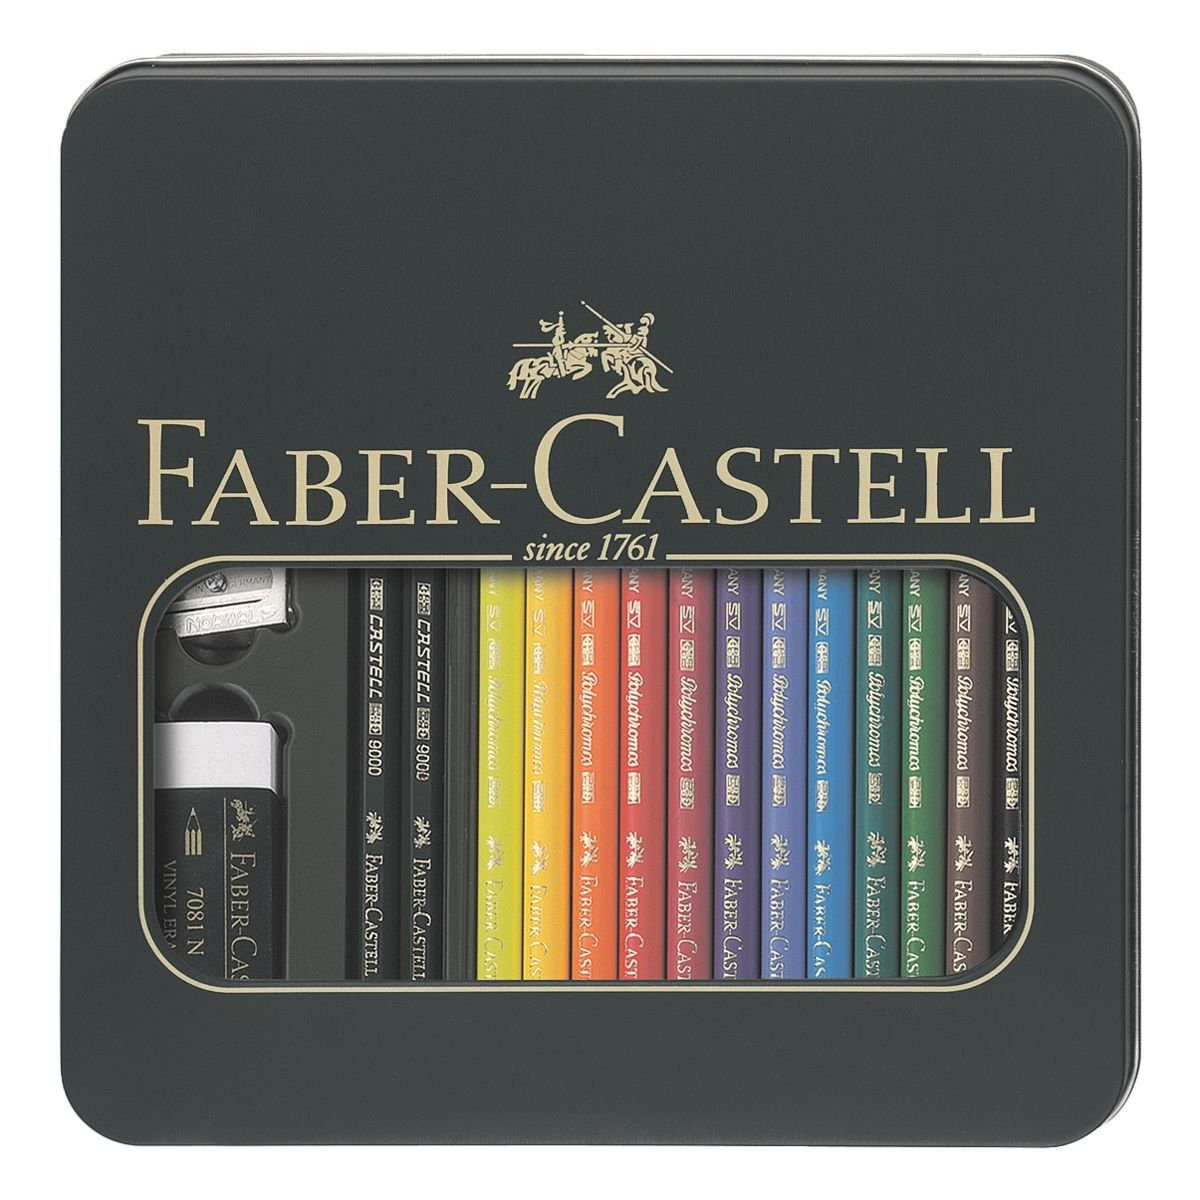 Faber Castell Künstlerfarbstifte »Polychromos Castell 9000«